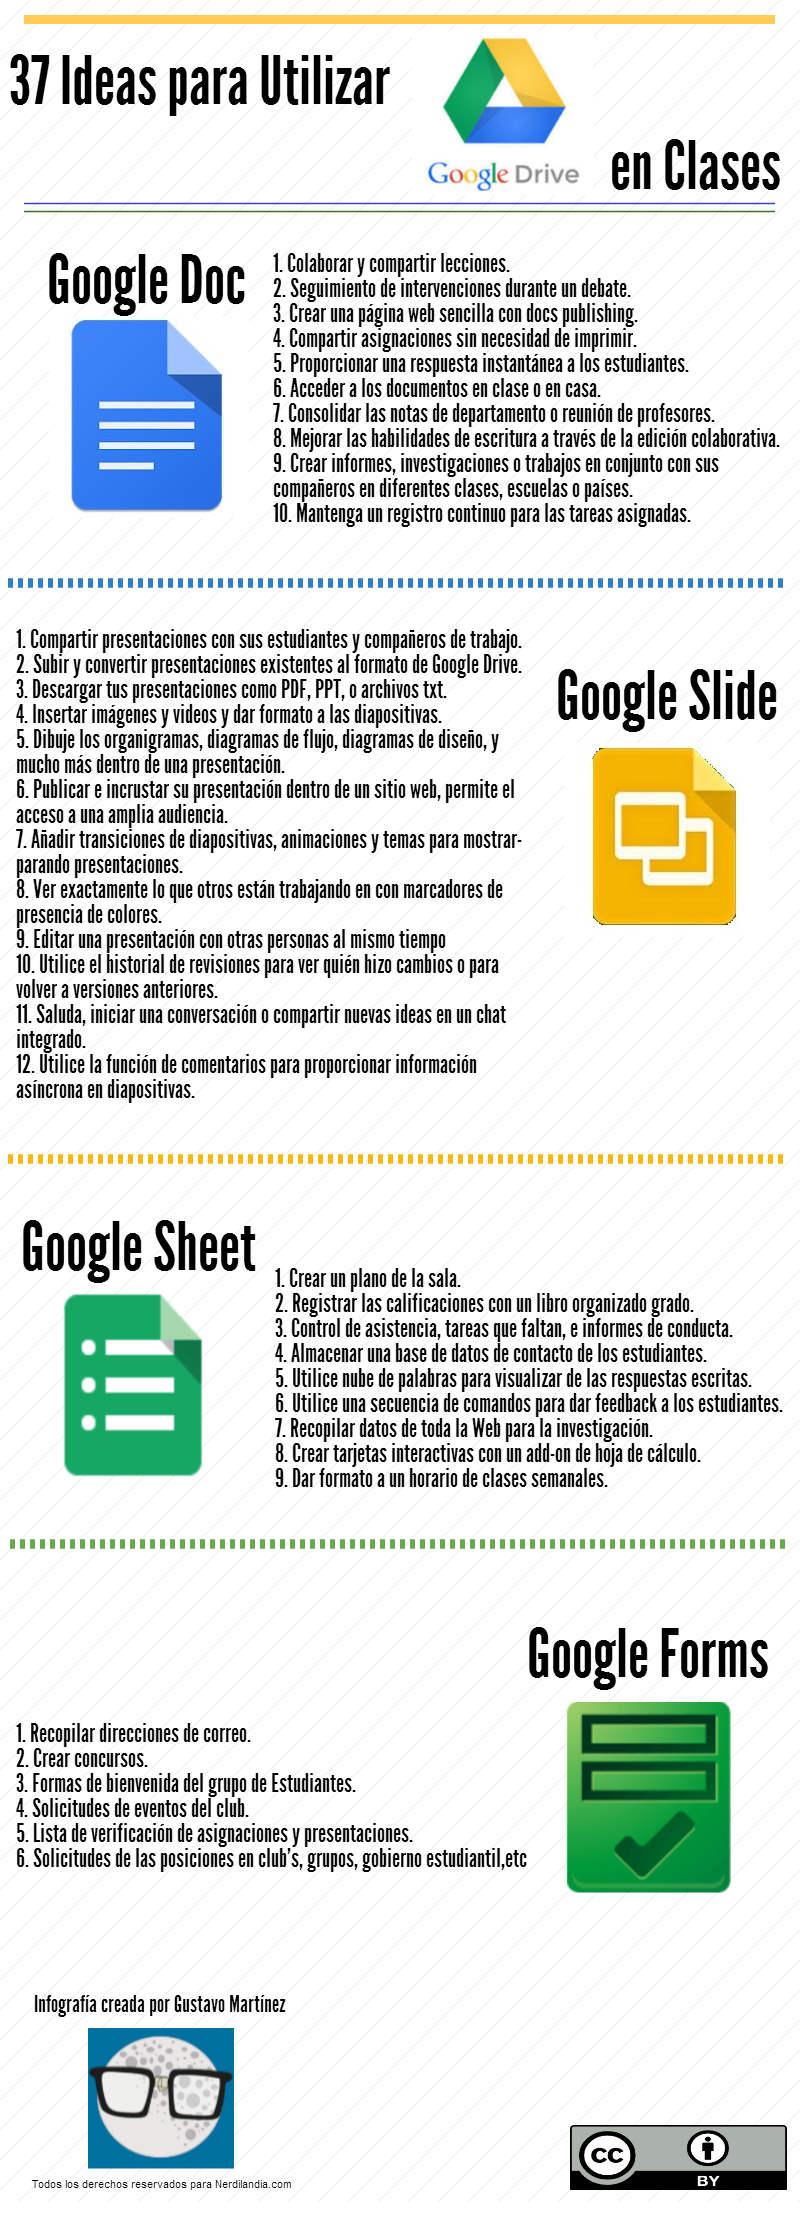 37 utilidades de Google para educación.  #RePin by AT Social Media Marketing - Pinterest Marketing Specialists ATSocialMedia.co.uk